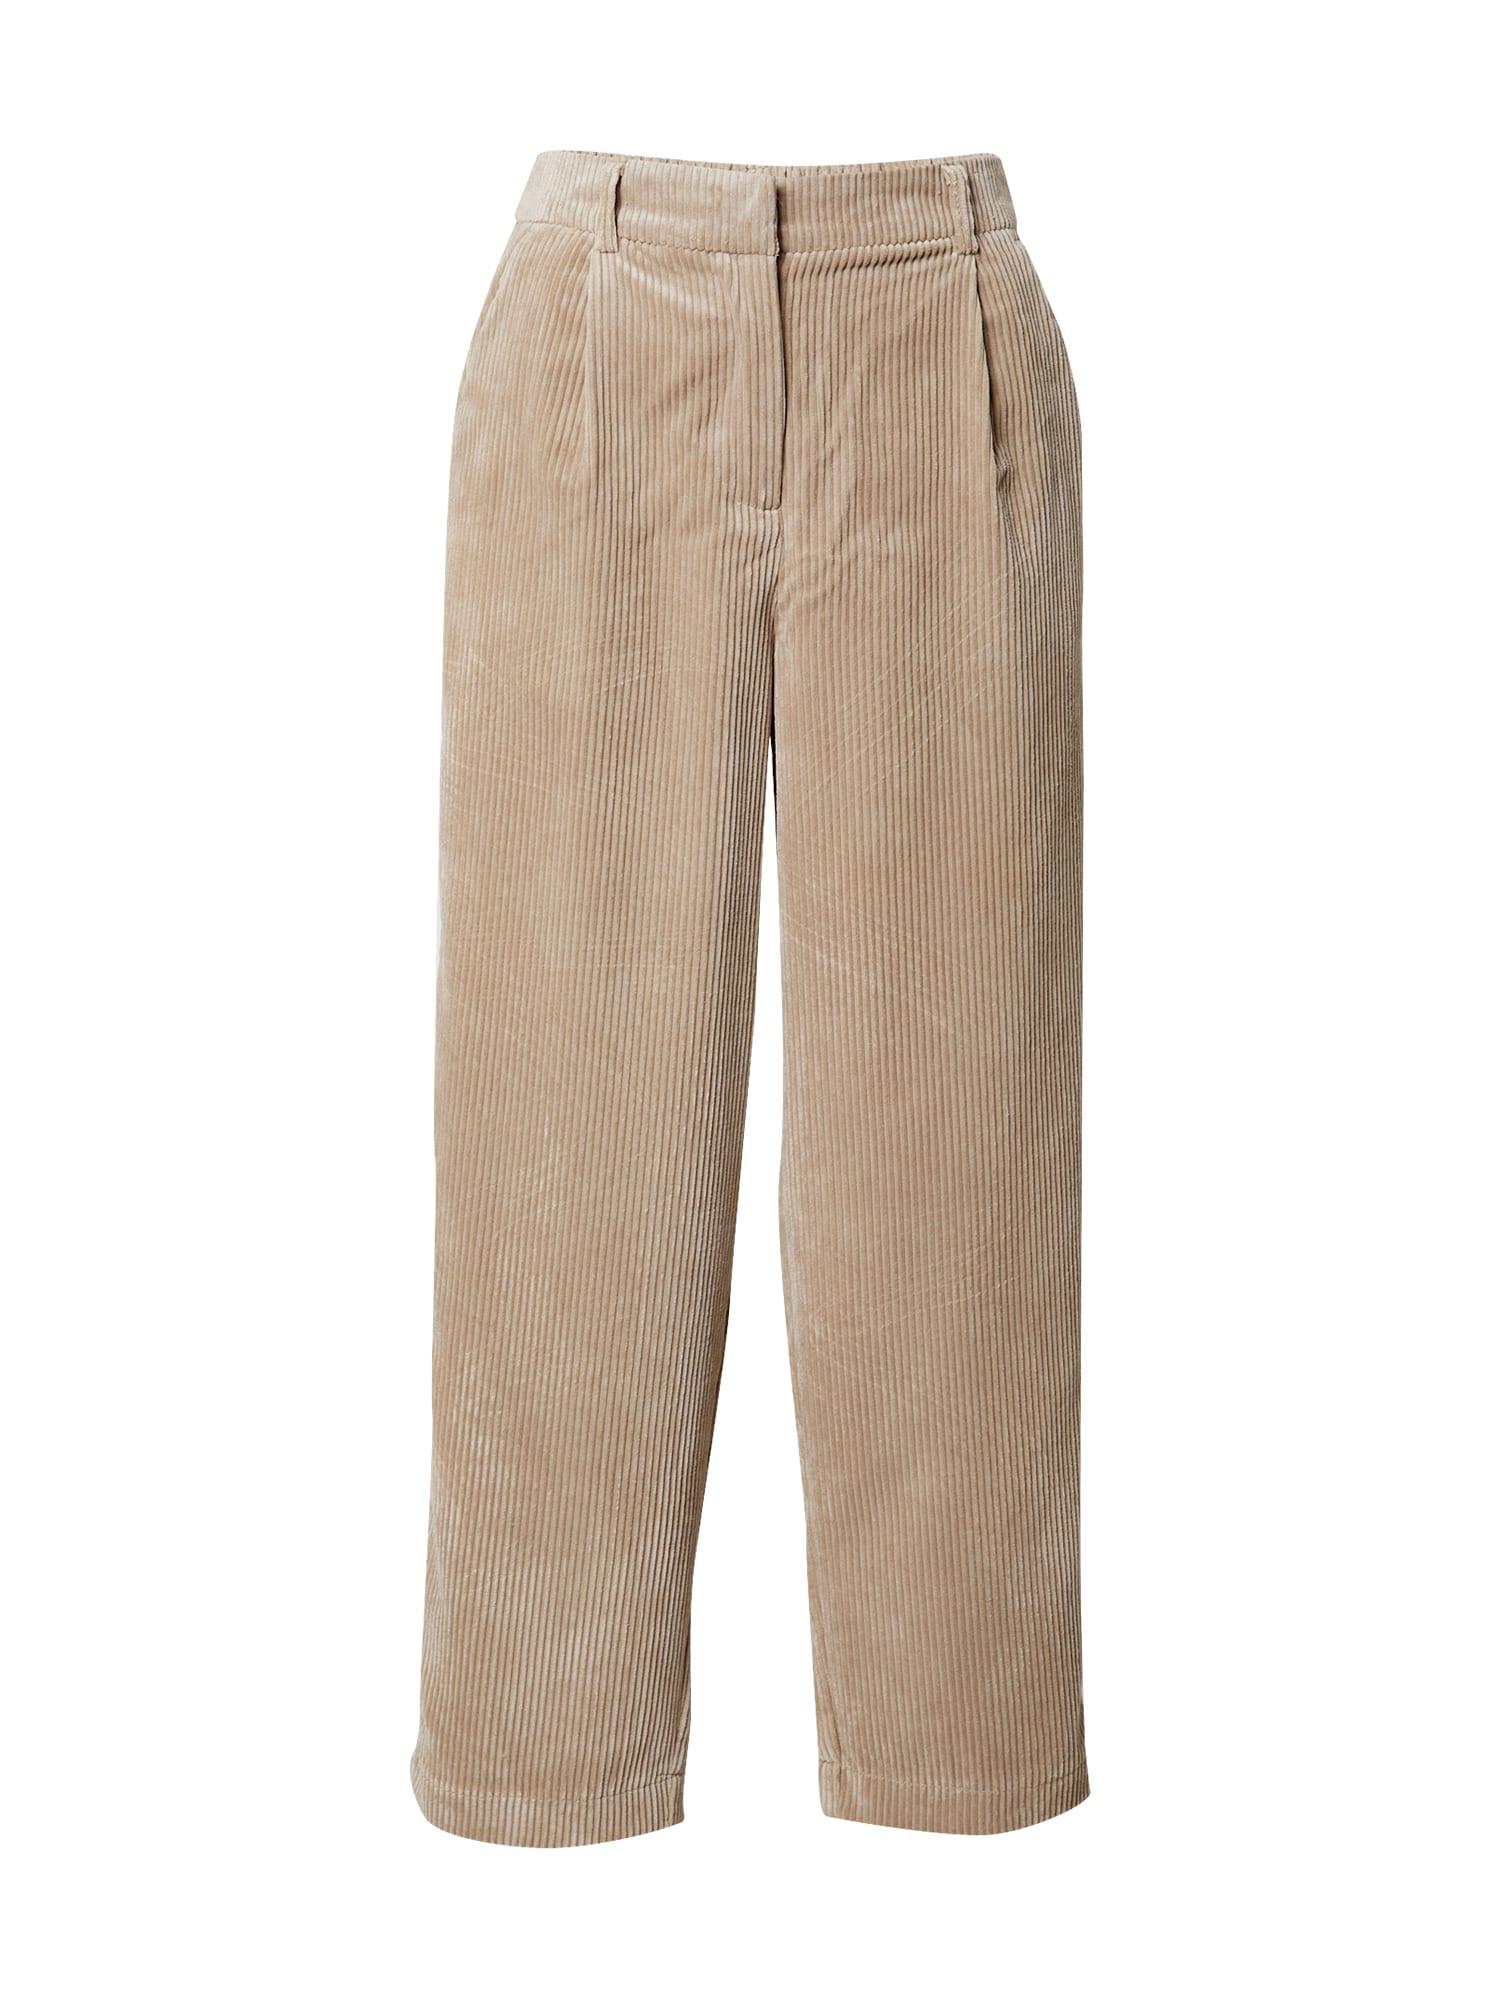 MOSS COPENHAGEN Klostuotos kelnės